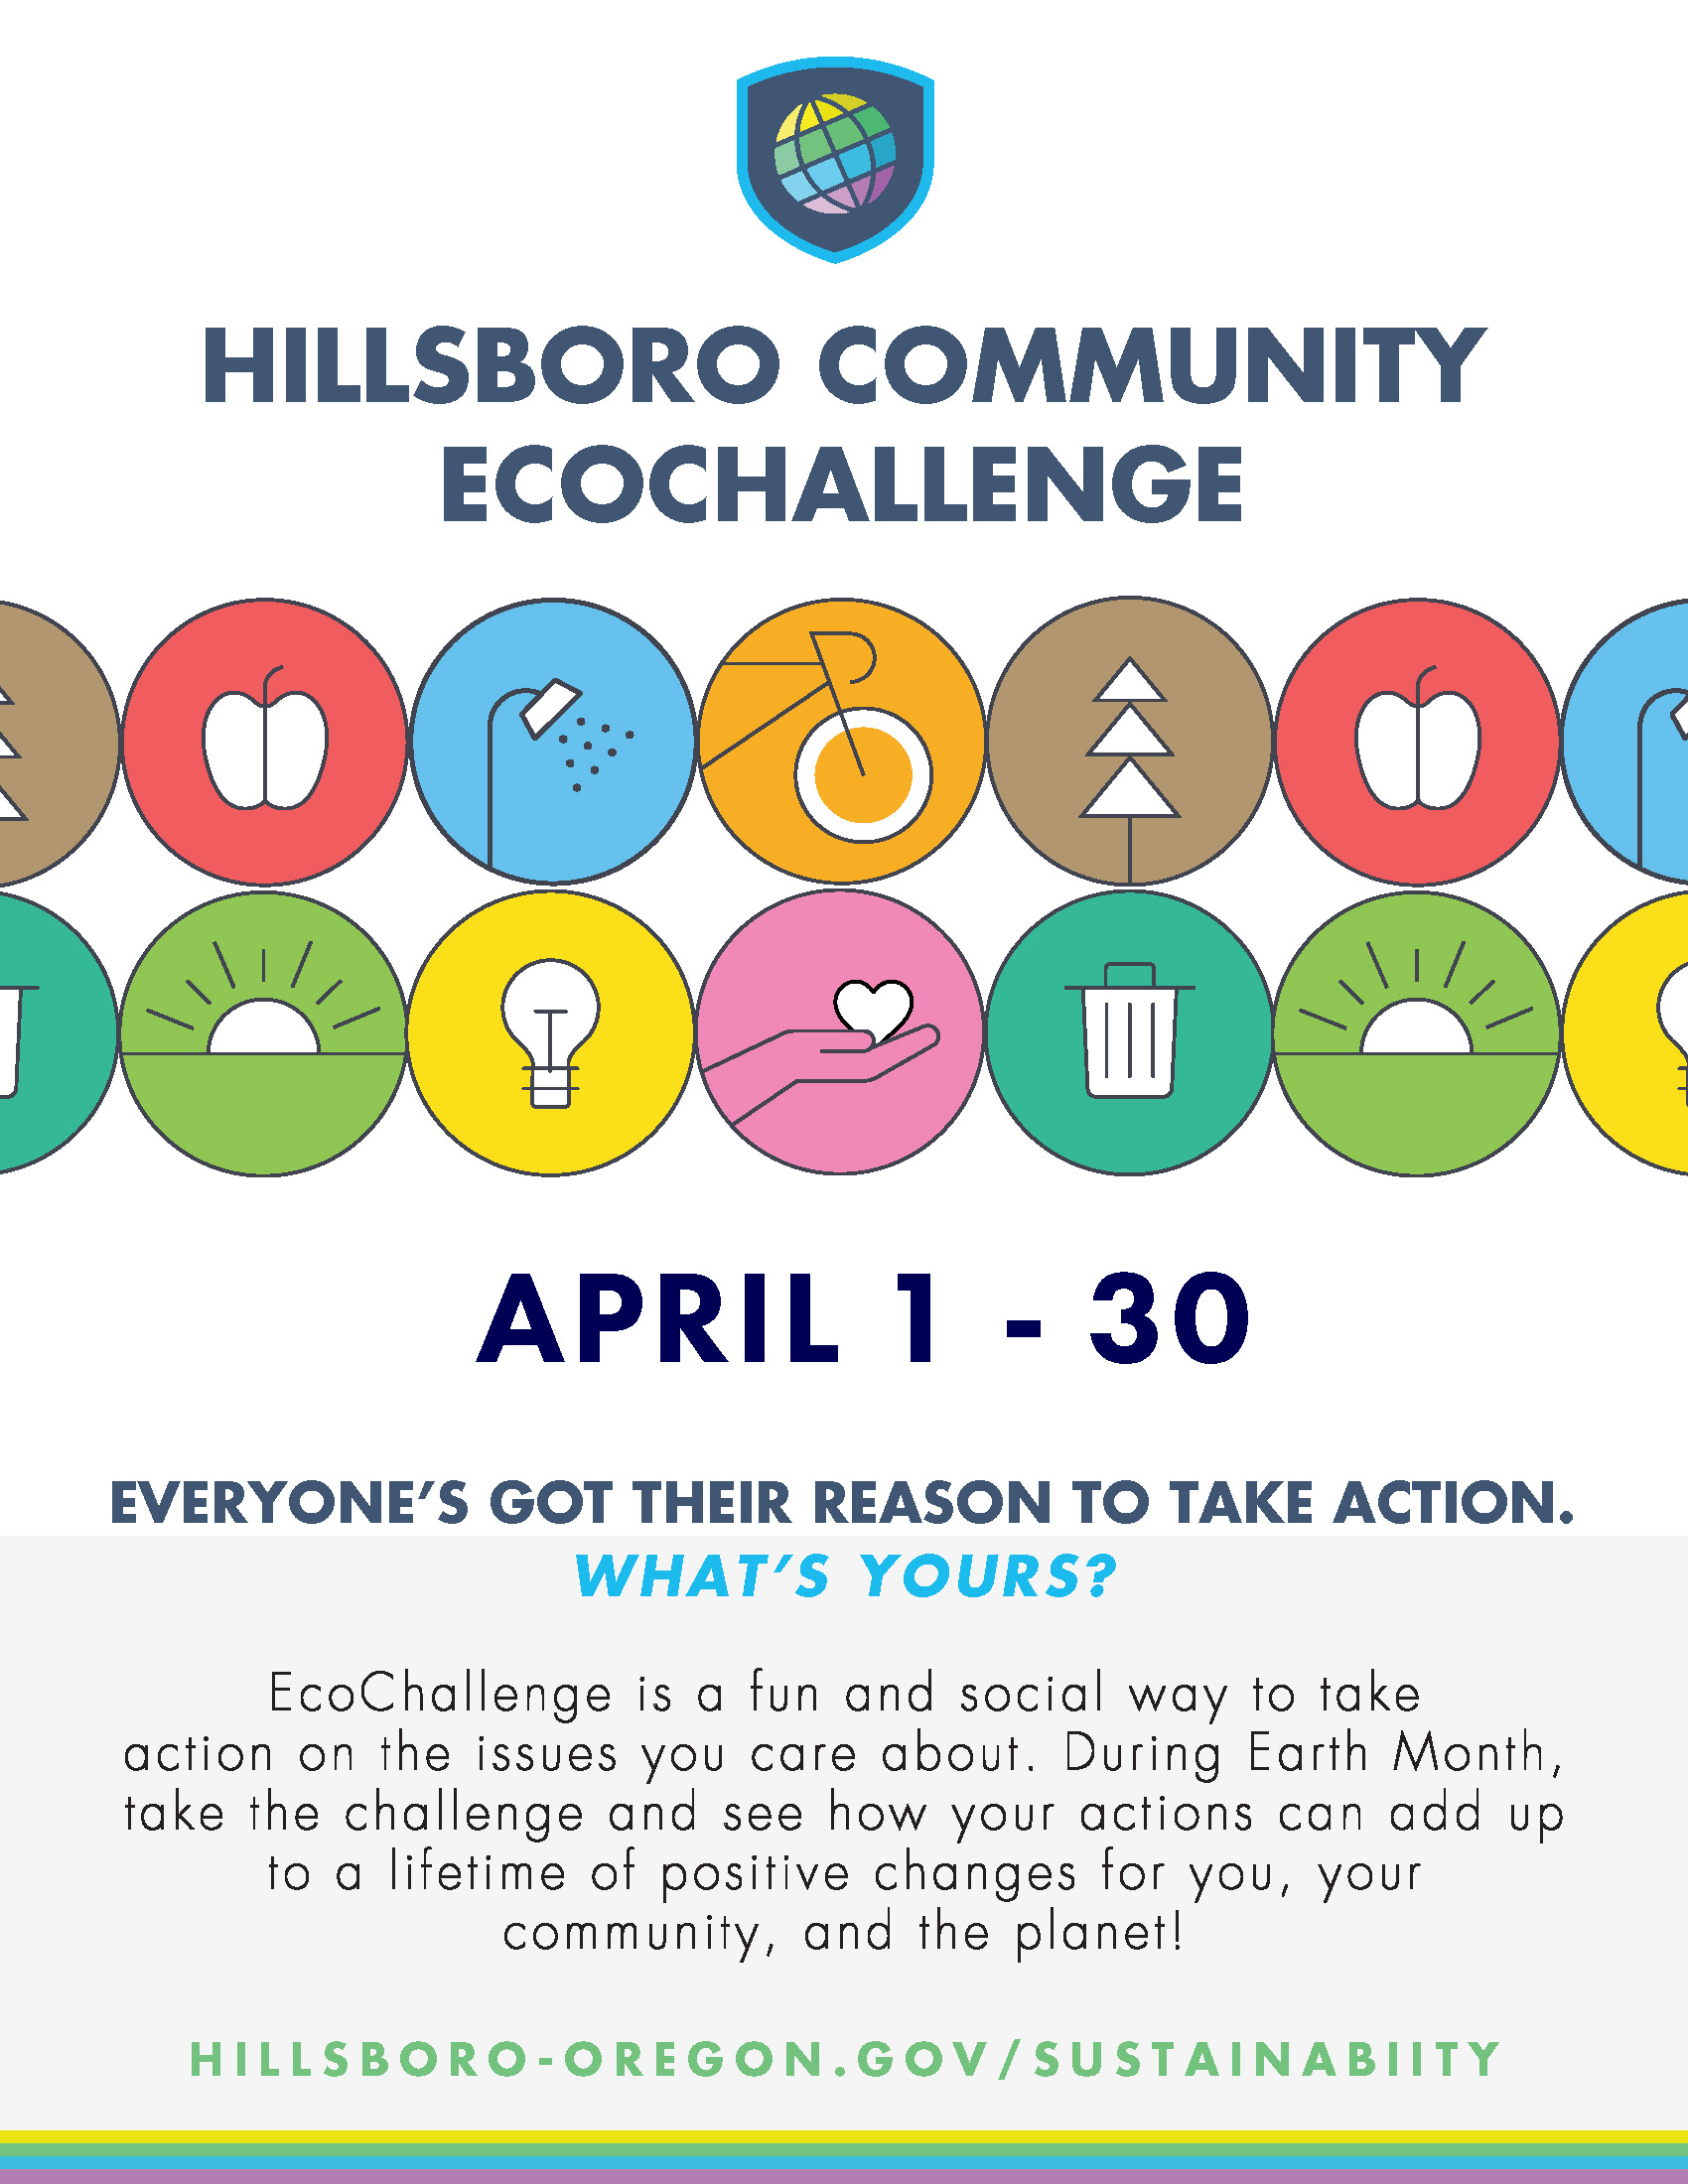 Hillsboro Community EcoChallenge Flyer.  April 1-30.